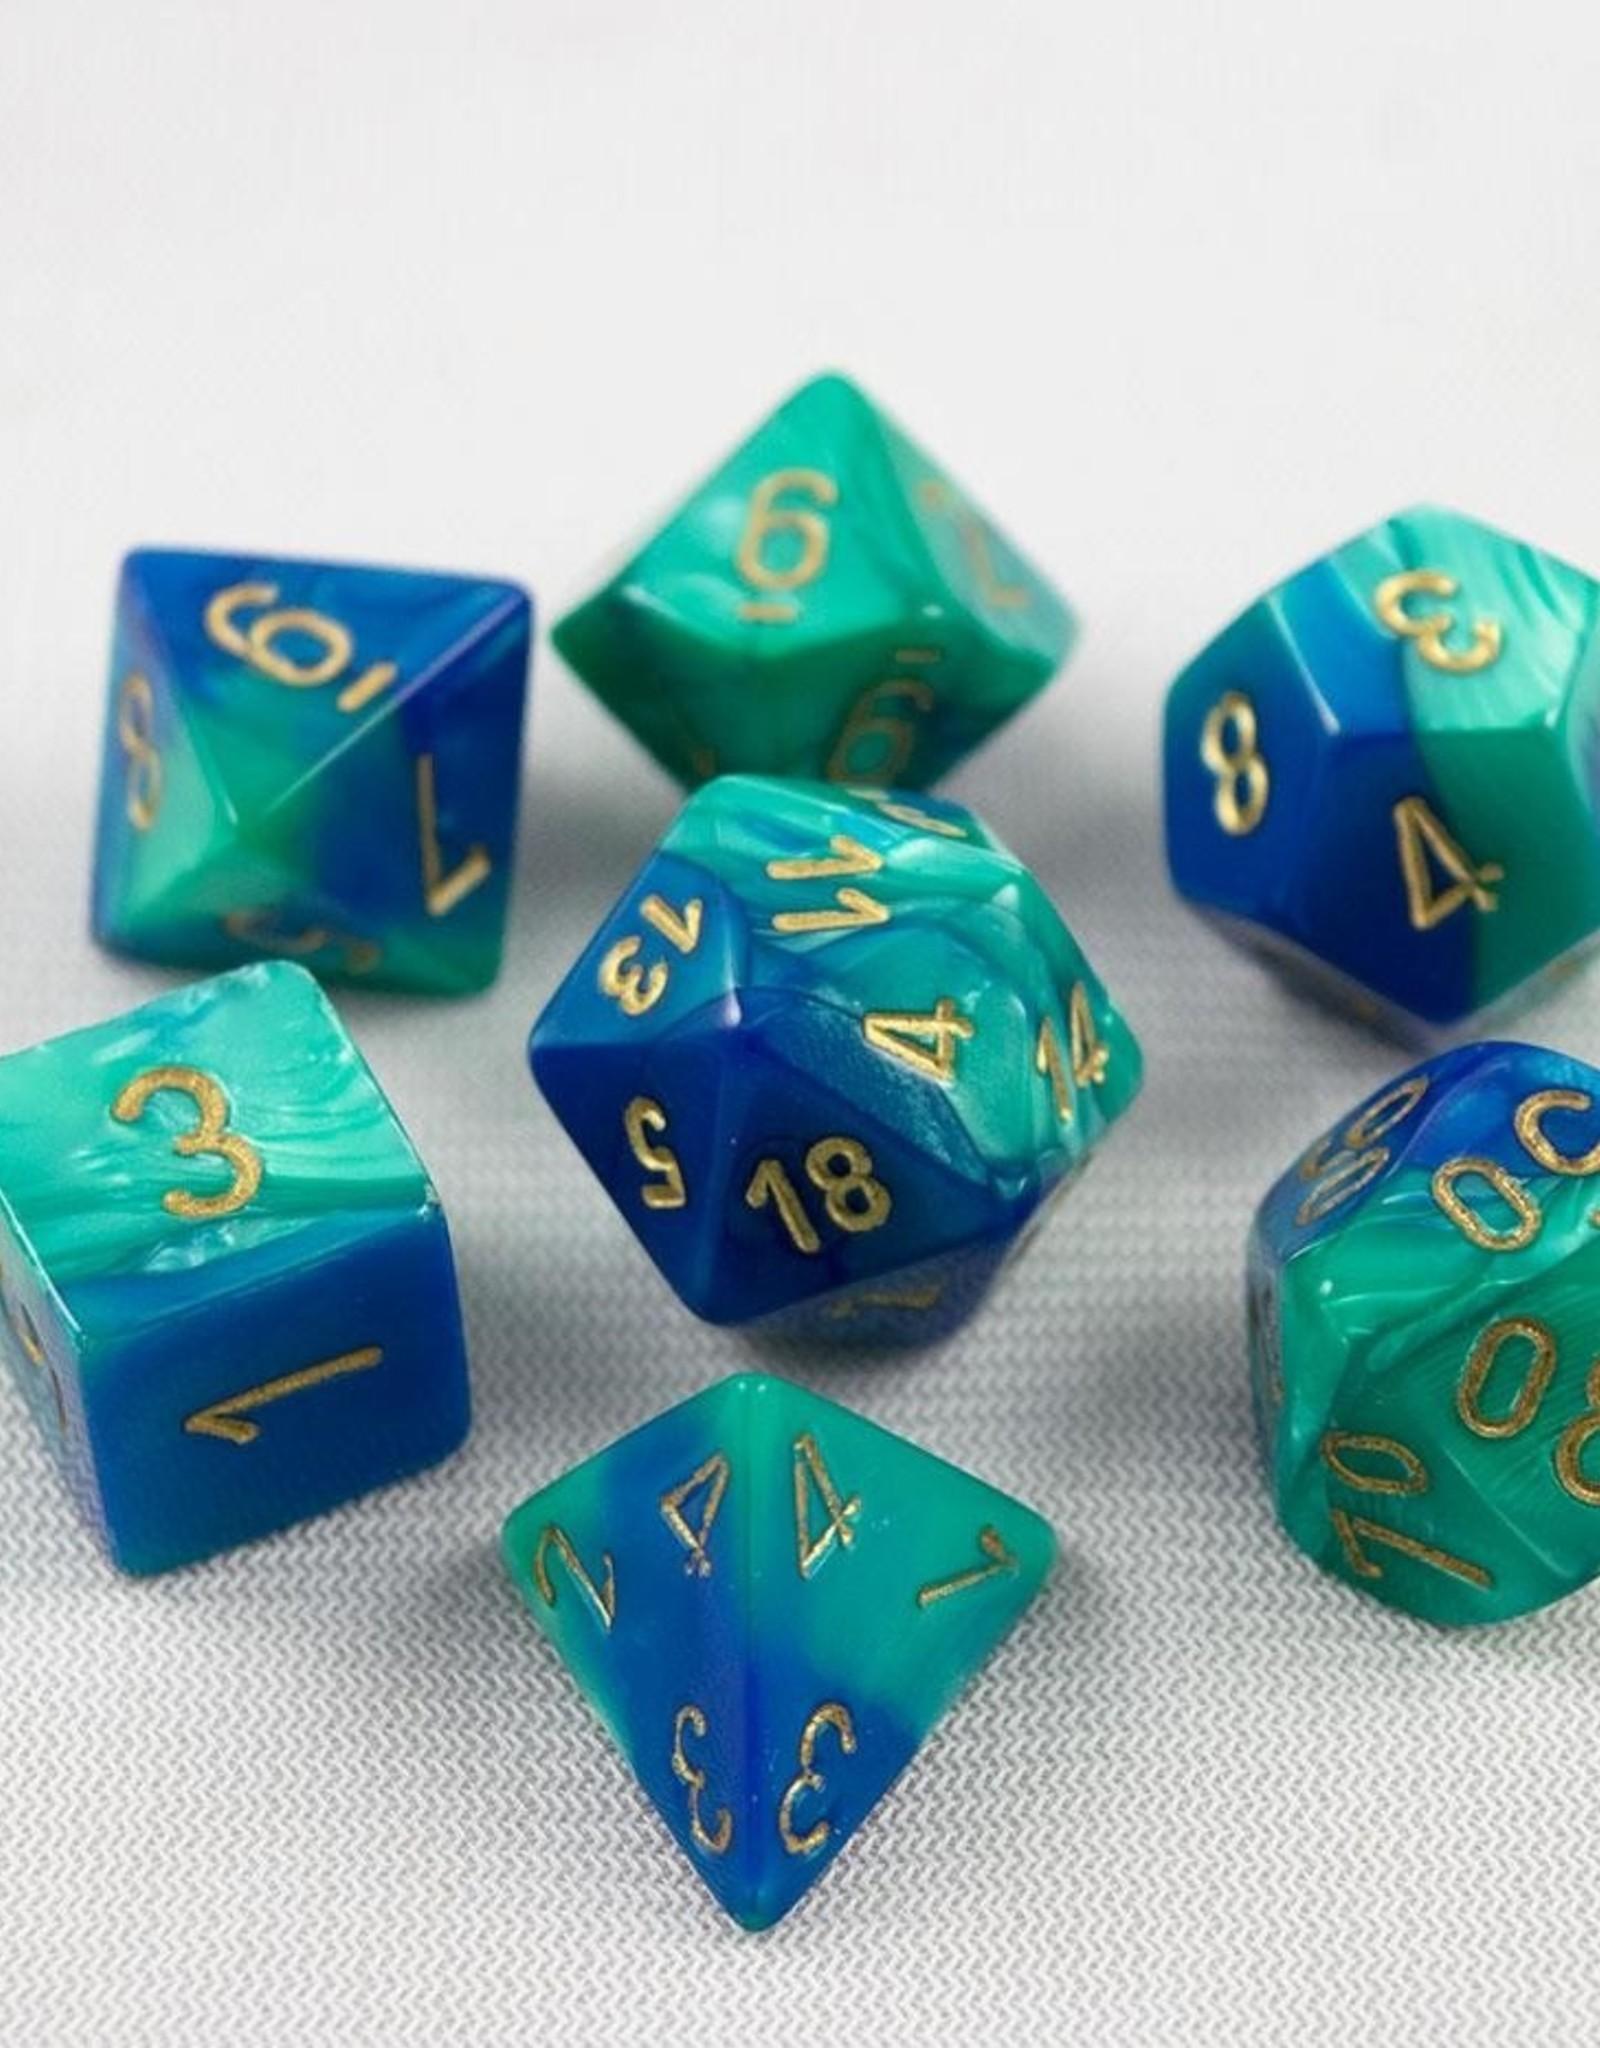 Chessex Chessex 7-Die set Gemini - Blue-Teal/Gold